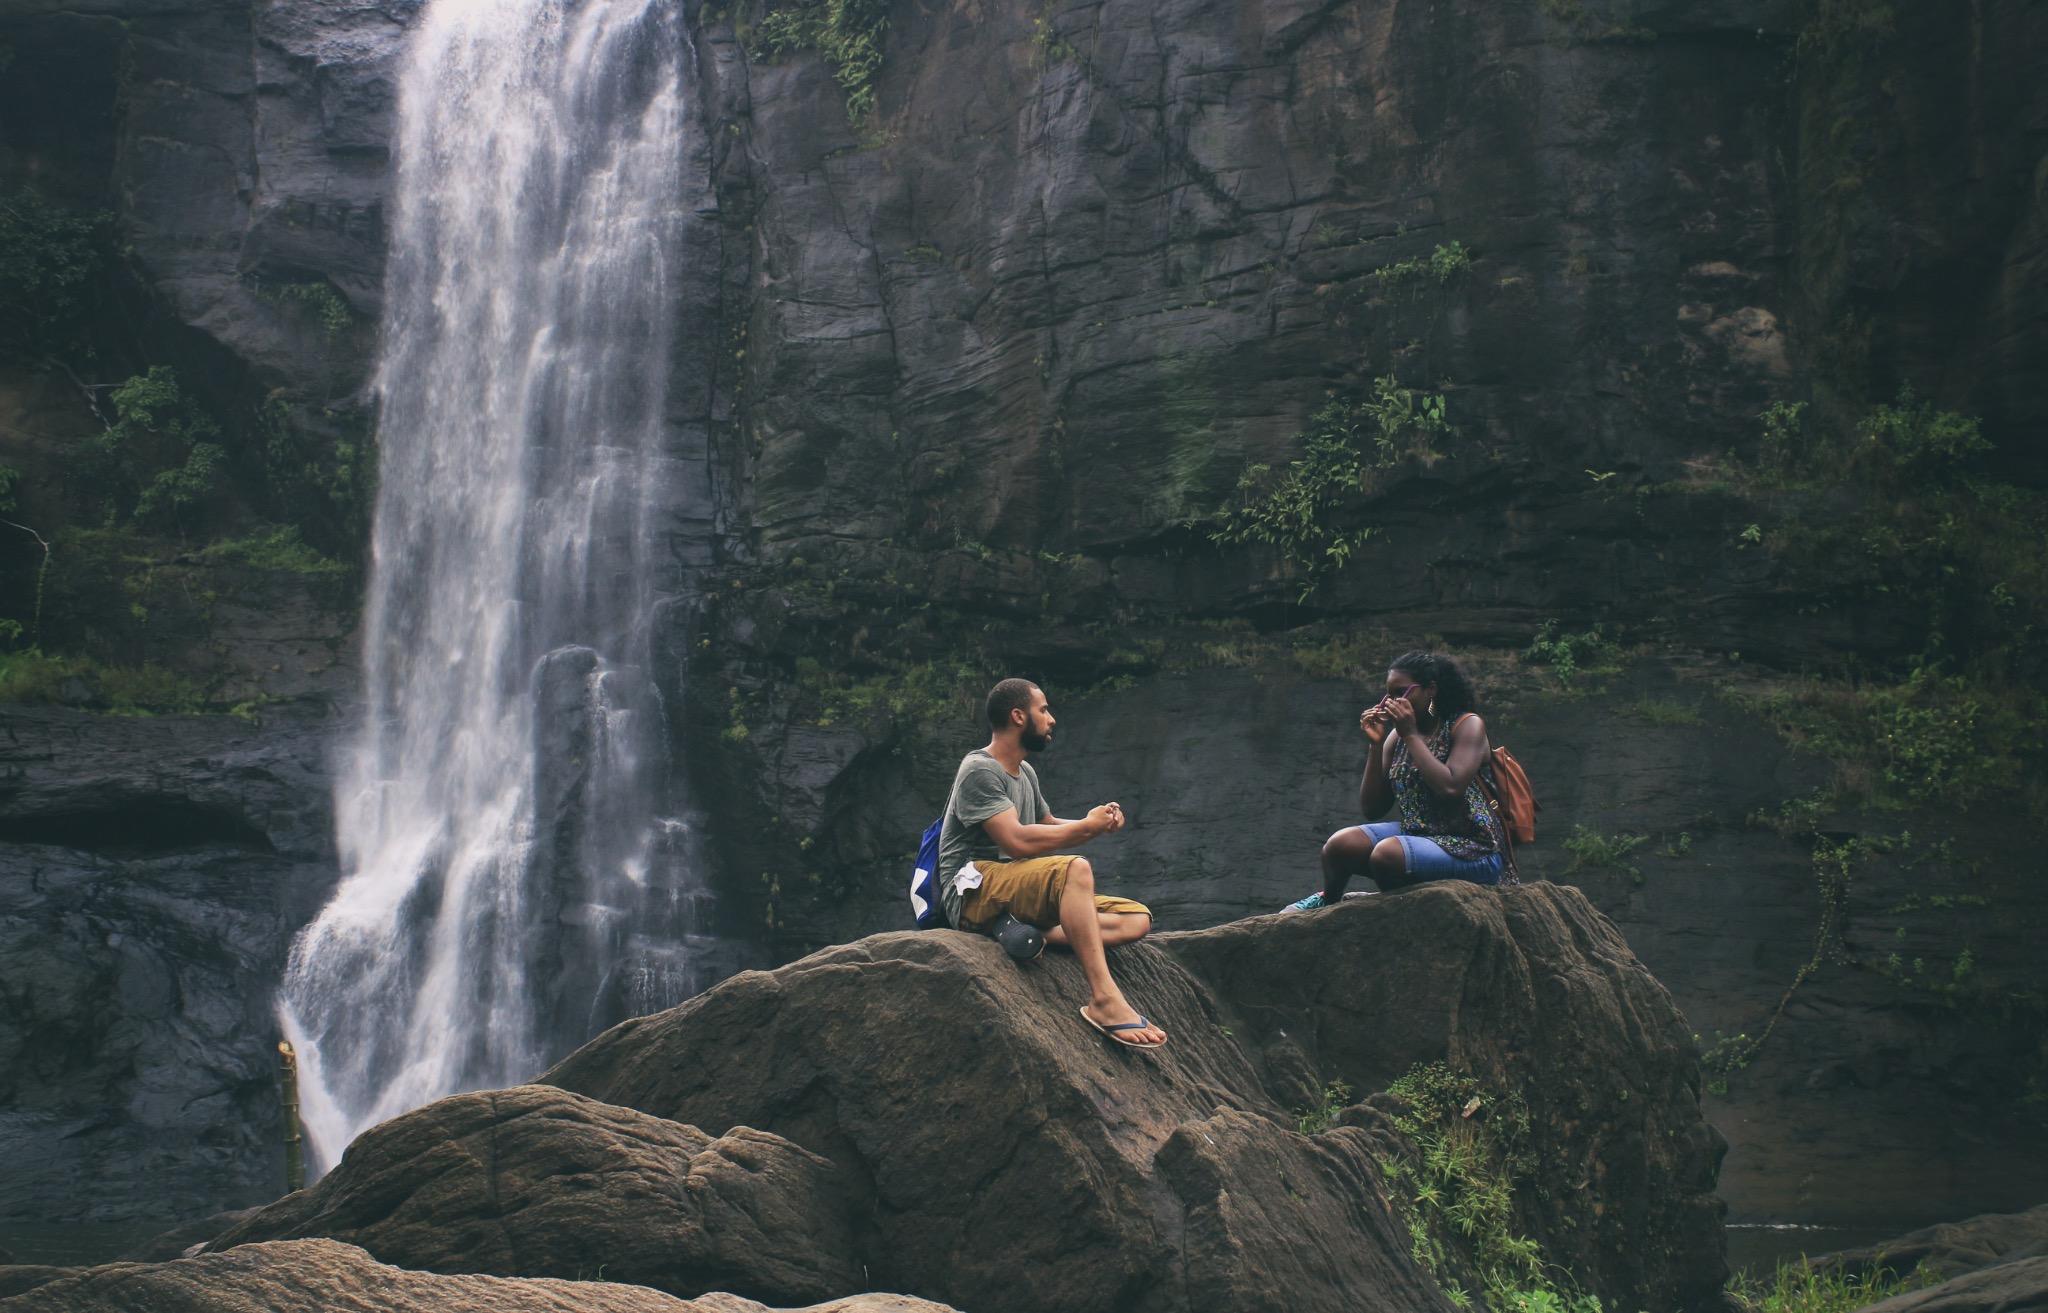 man and woman near waterfall